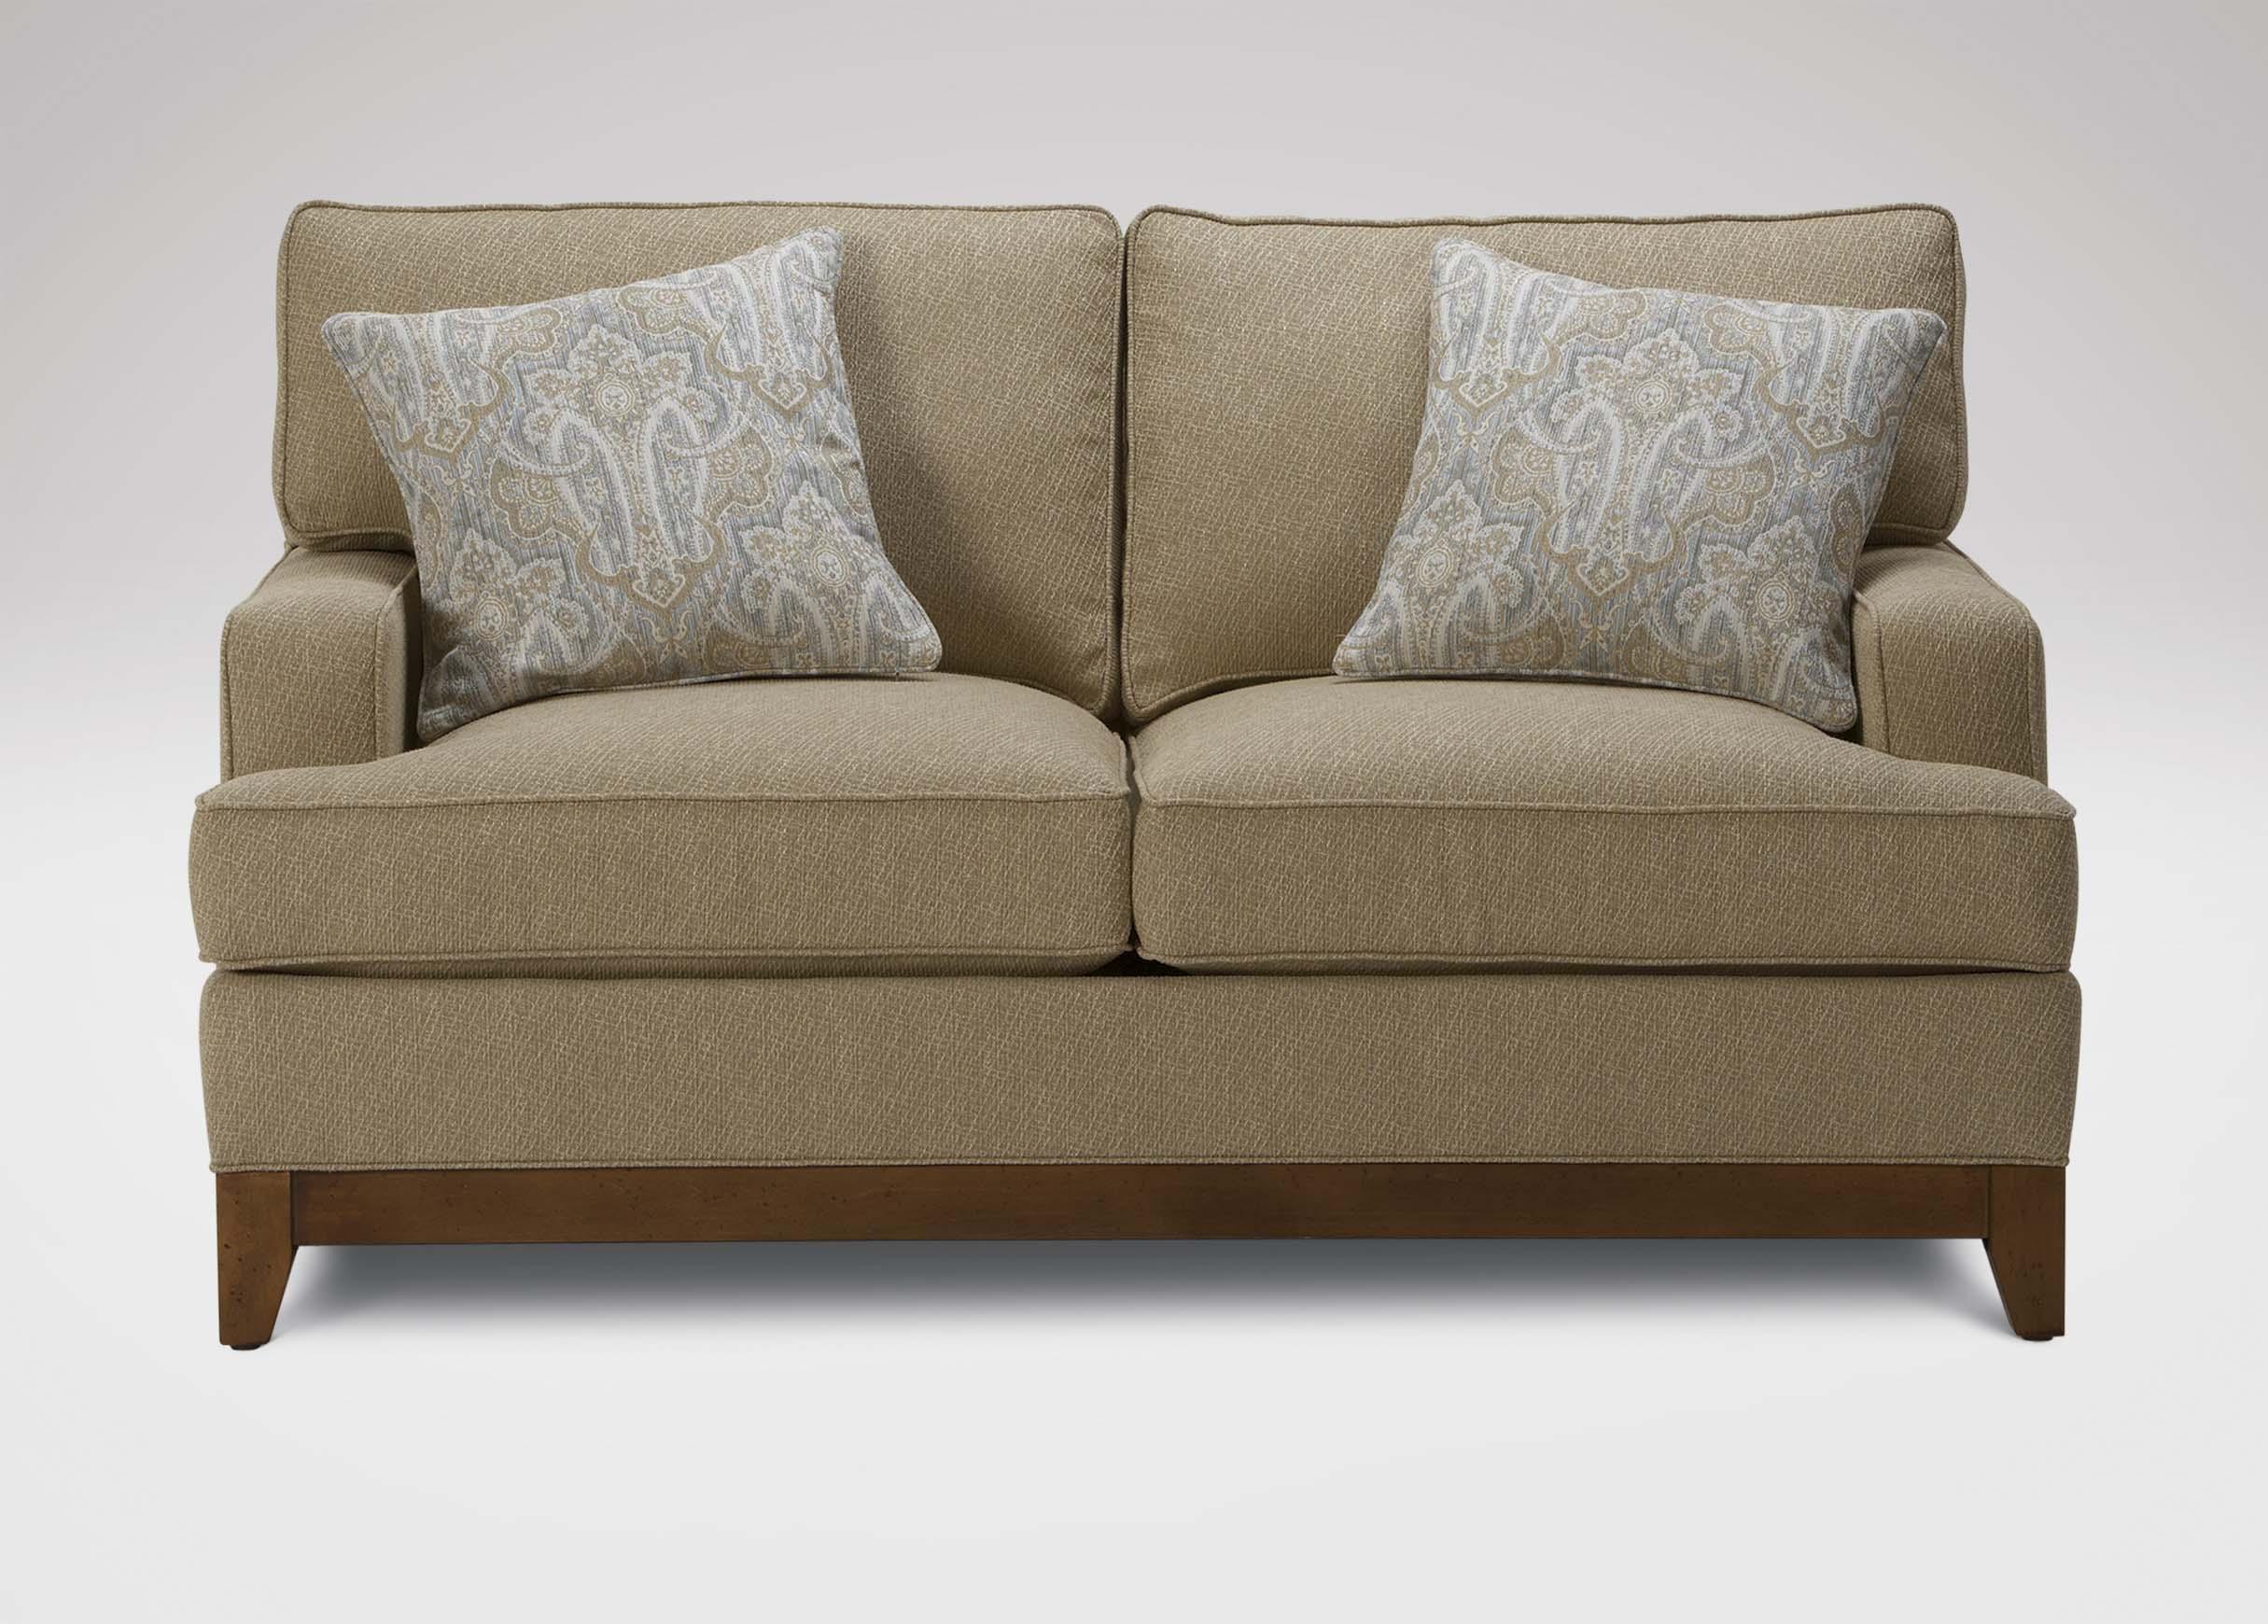 Arcata Sofa | Sofas & Loveseats Regarding Ethan Allen Sofas And Chairs (Image 3 of 20)